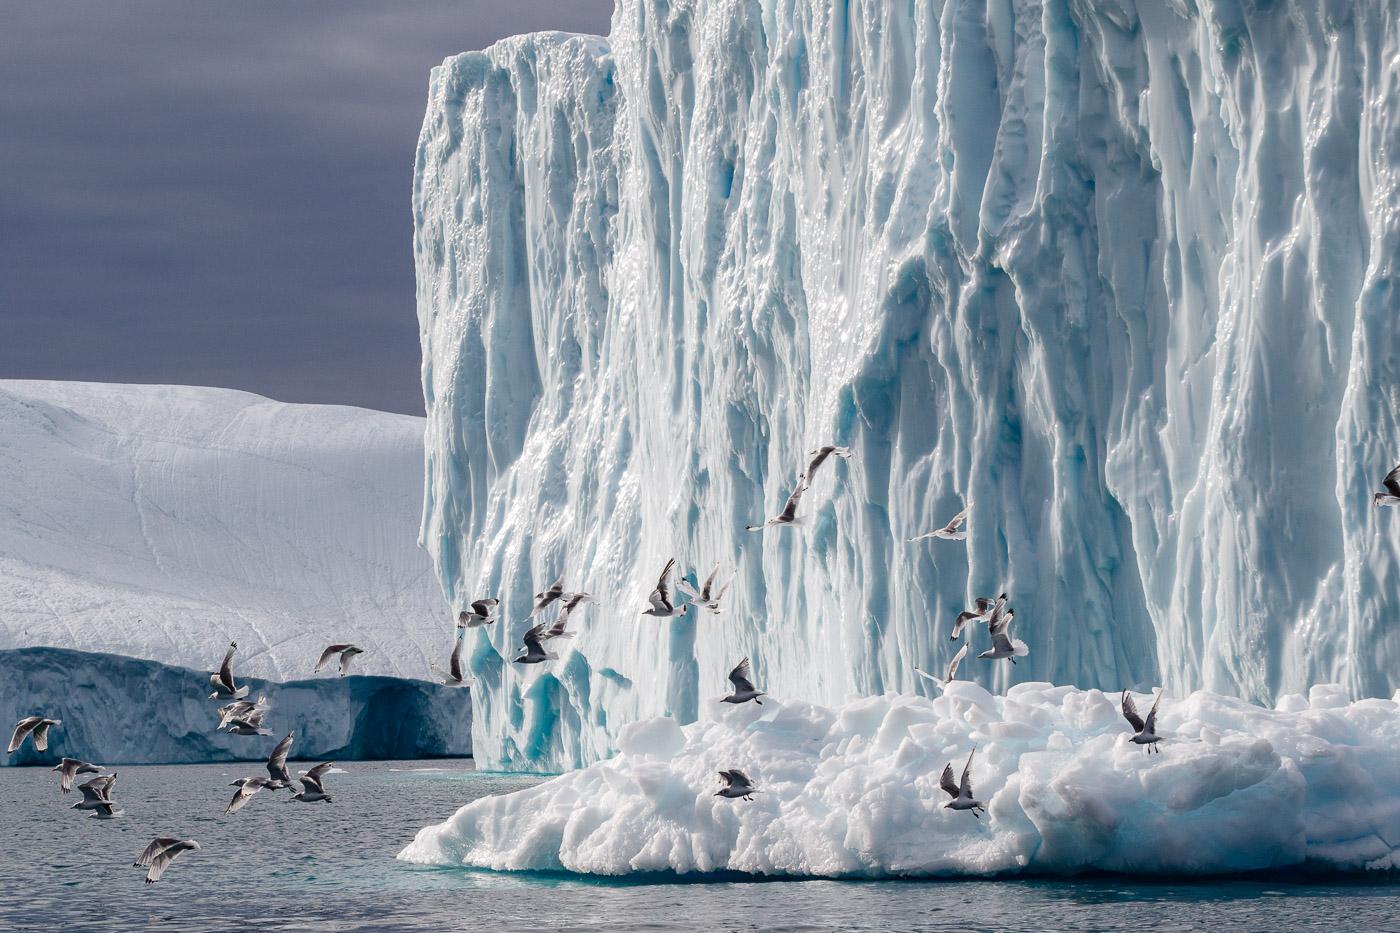 Leaving the Iceberg